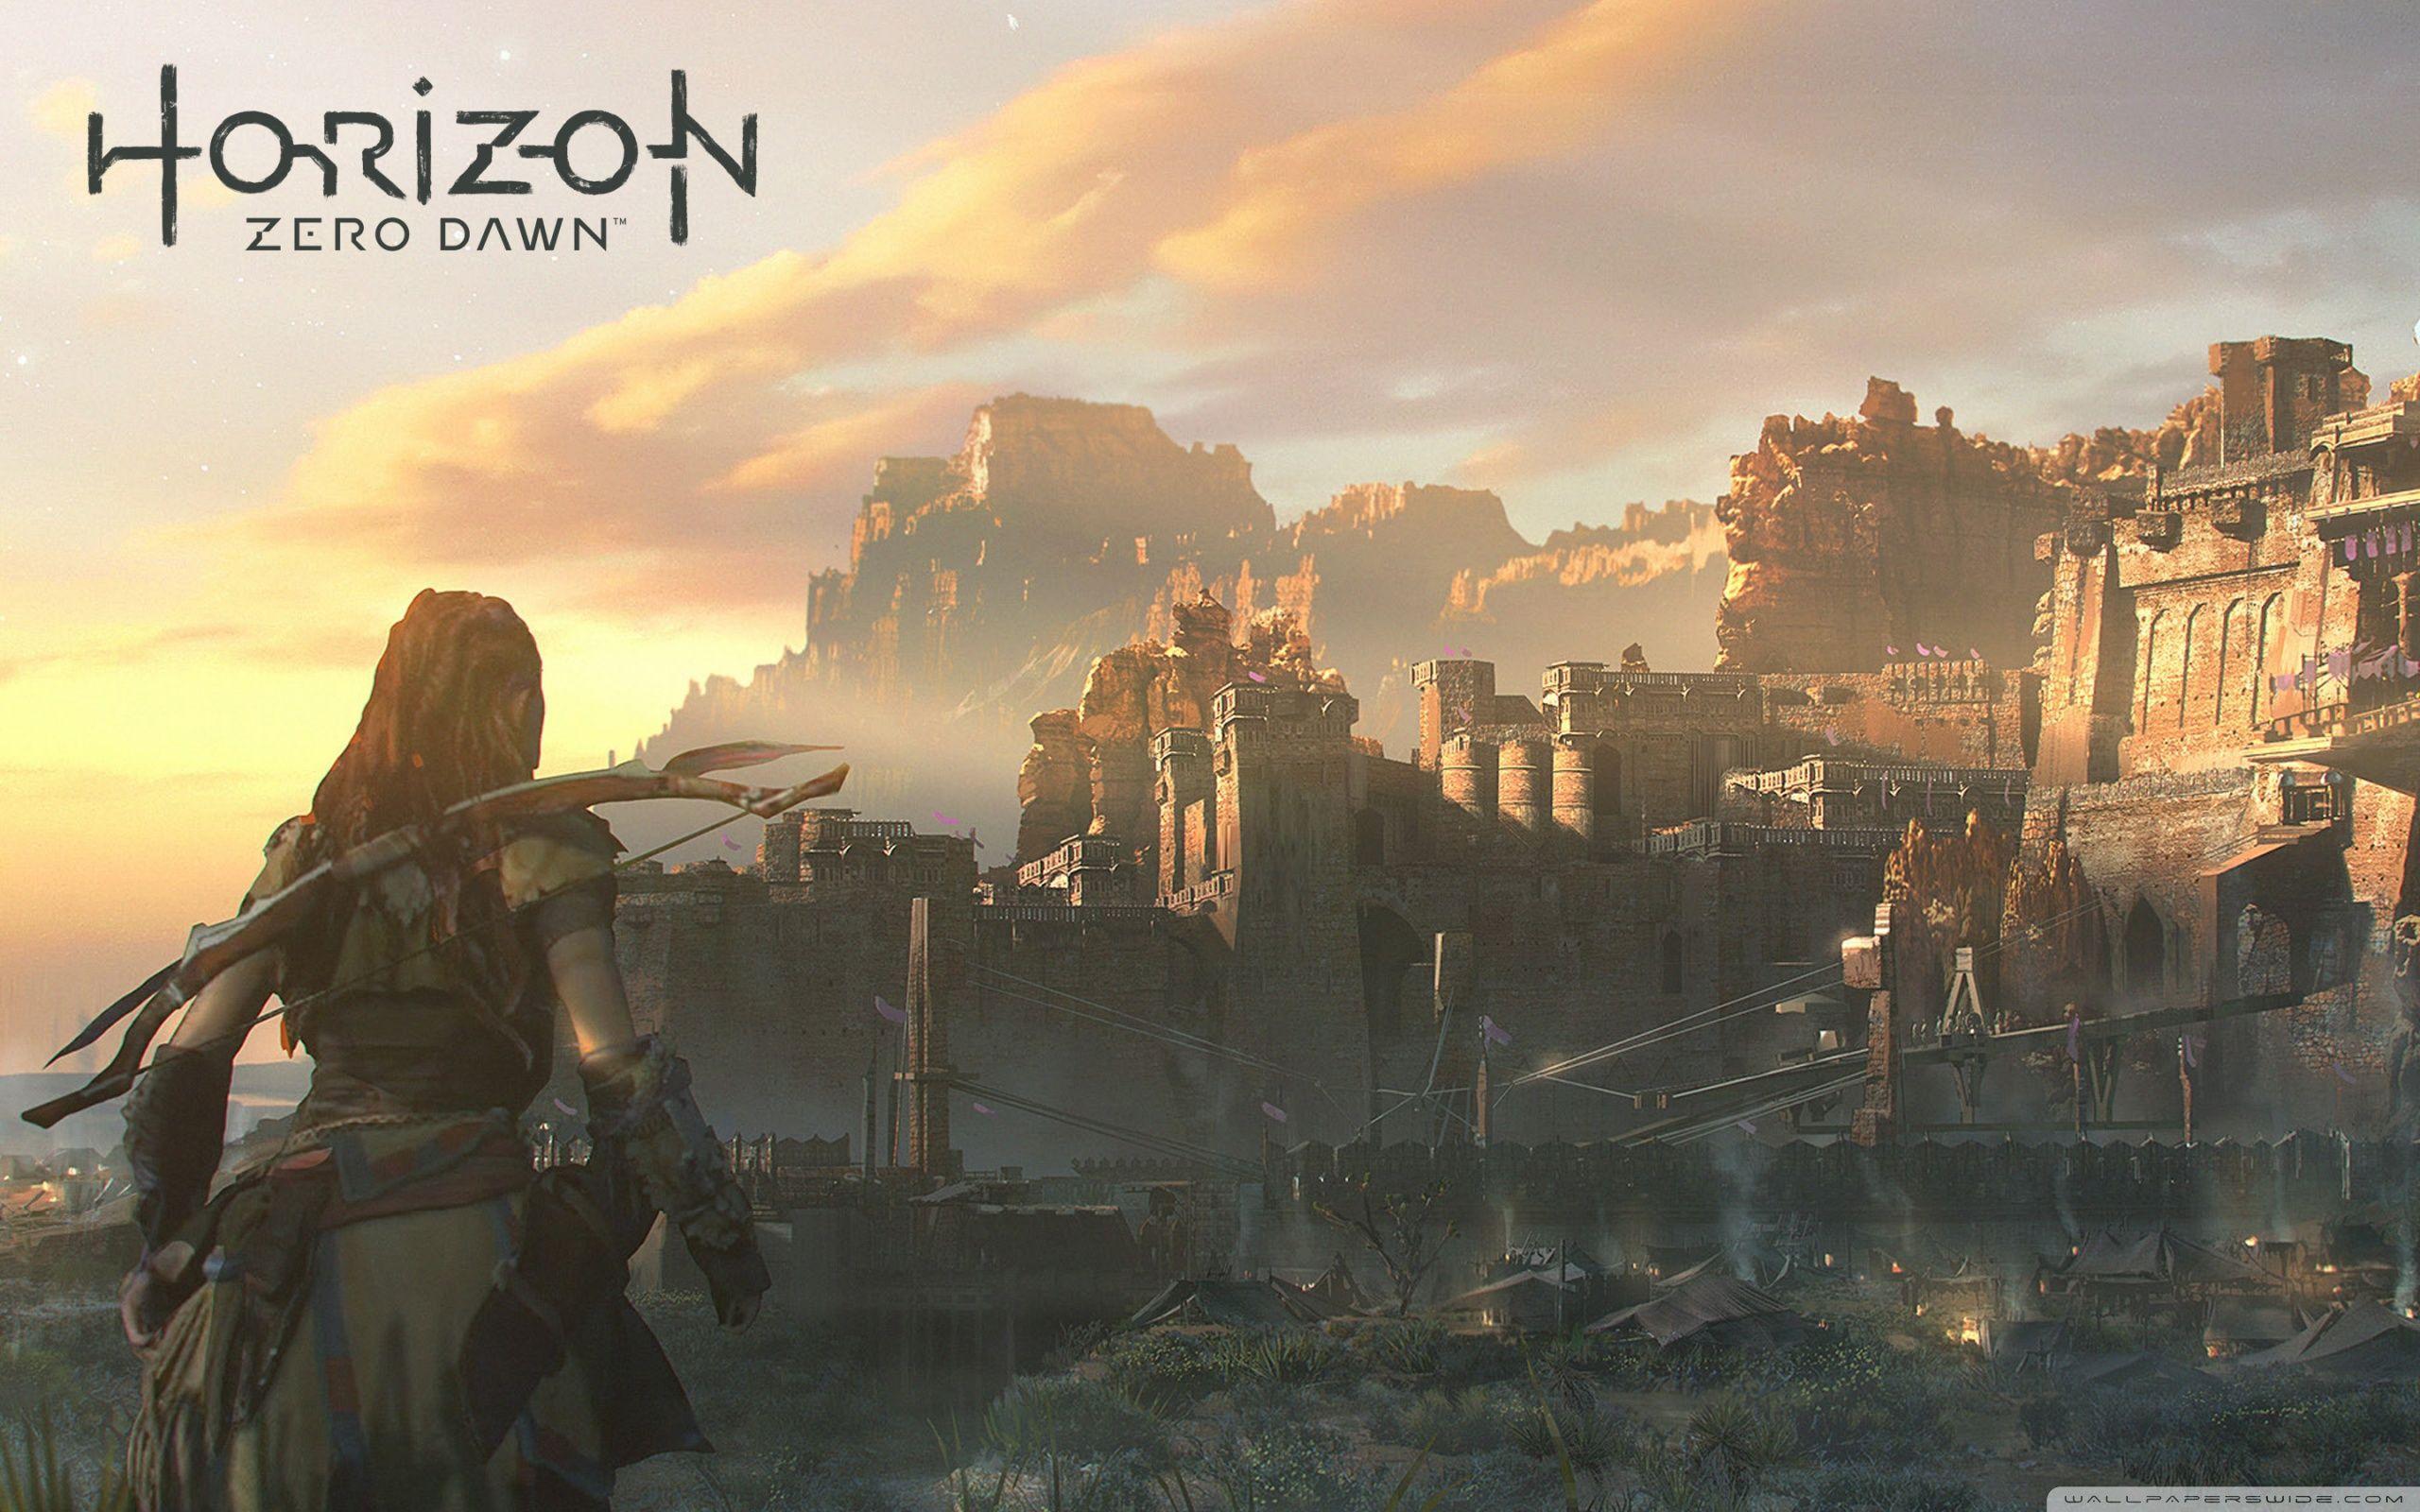 Top Free Liverpool Backgrounds: Horizon Zero Dawn 1440P Wallpapers